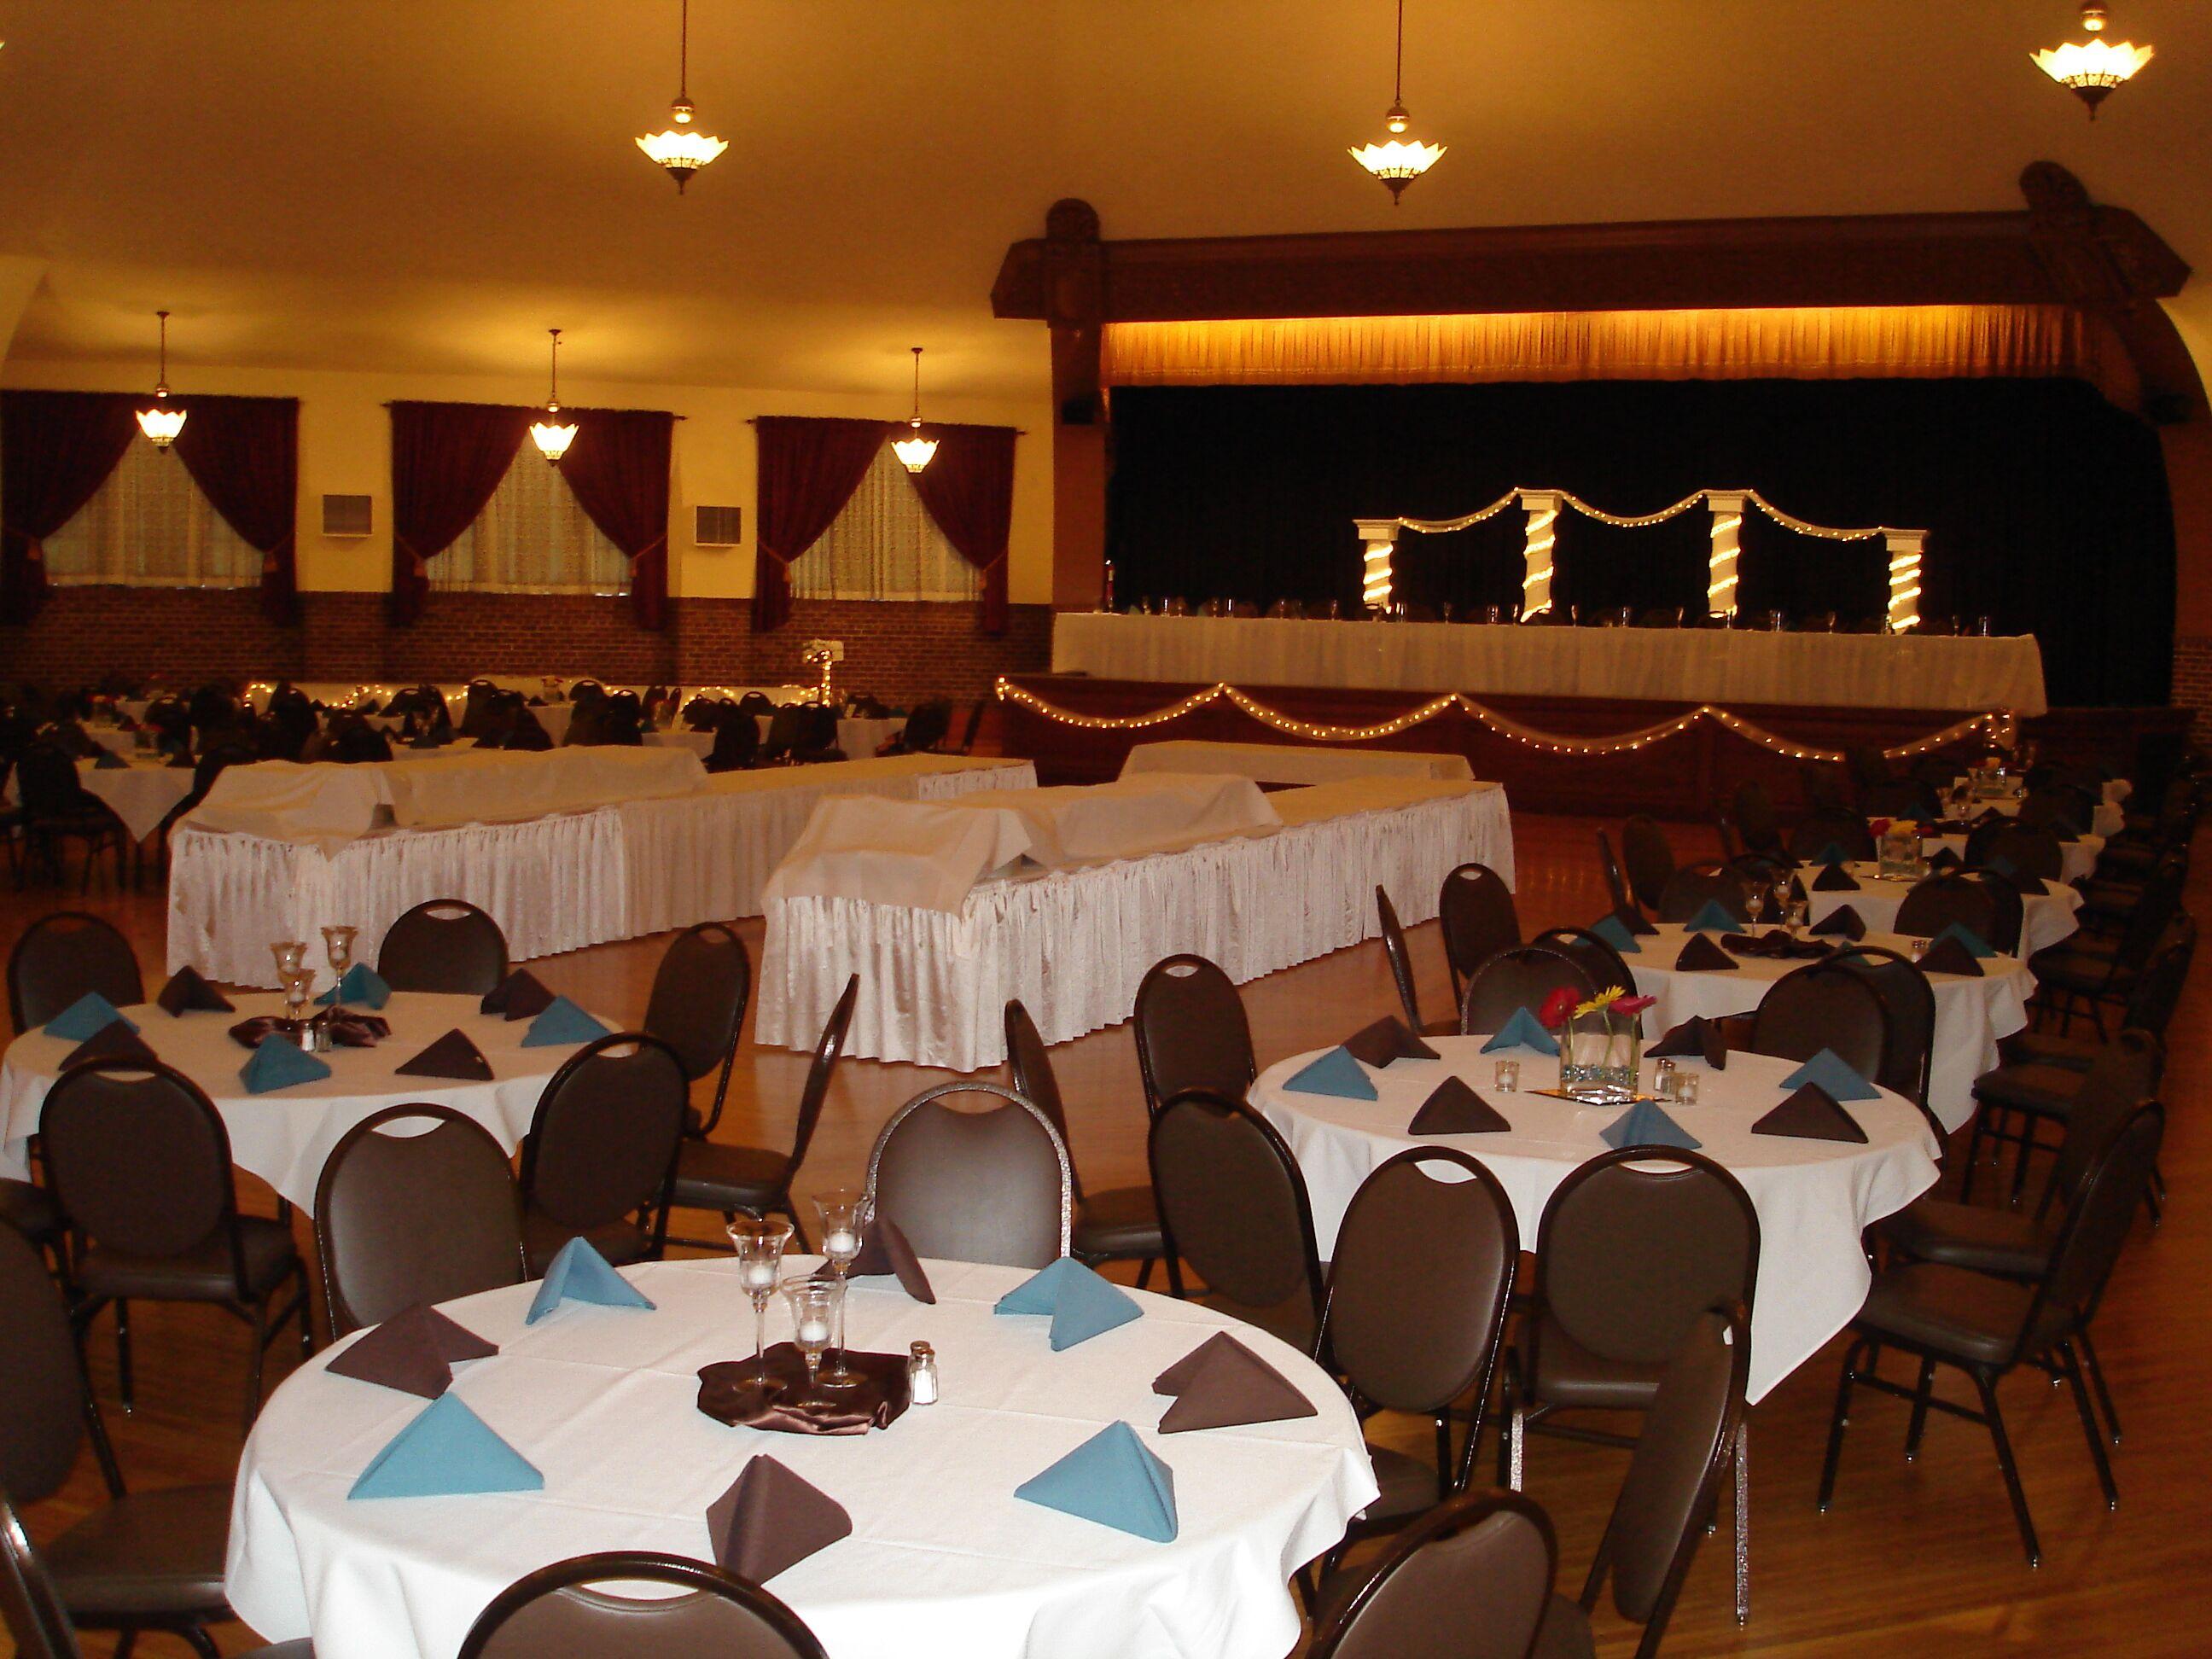 Chandelier ballroom unveil chandelier ballroom arubaitofo Gallery